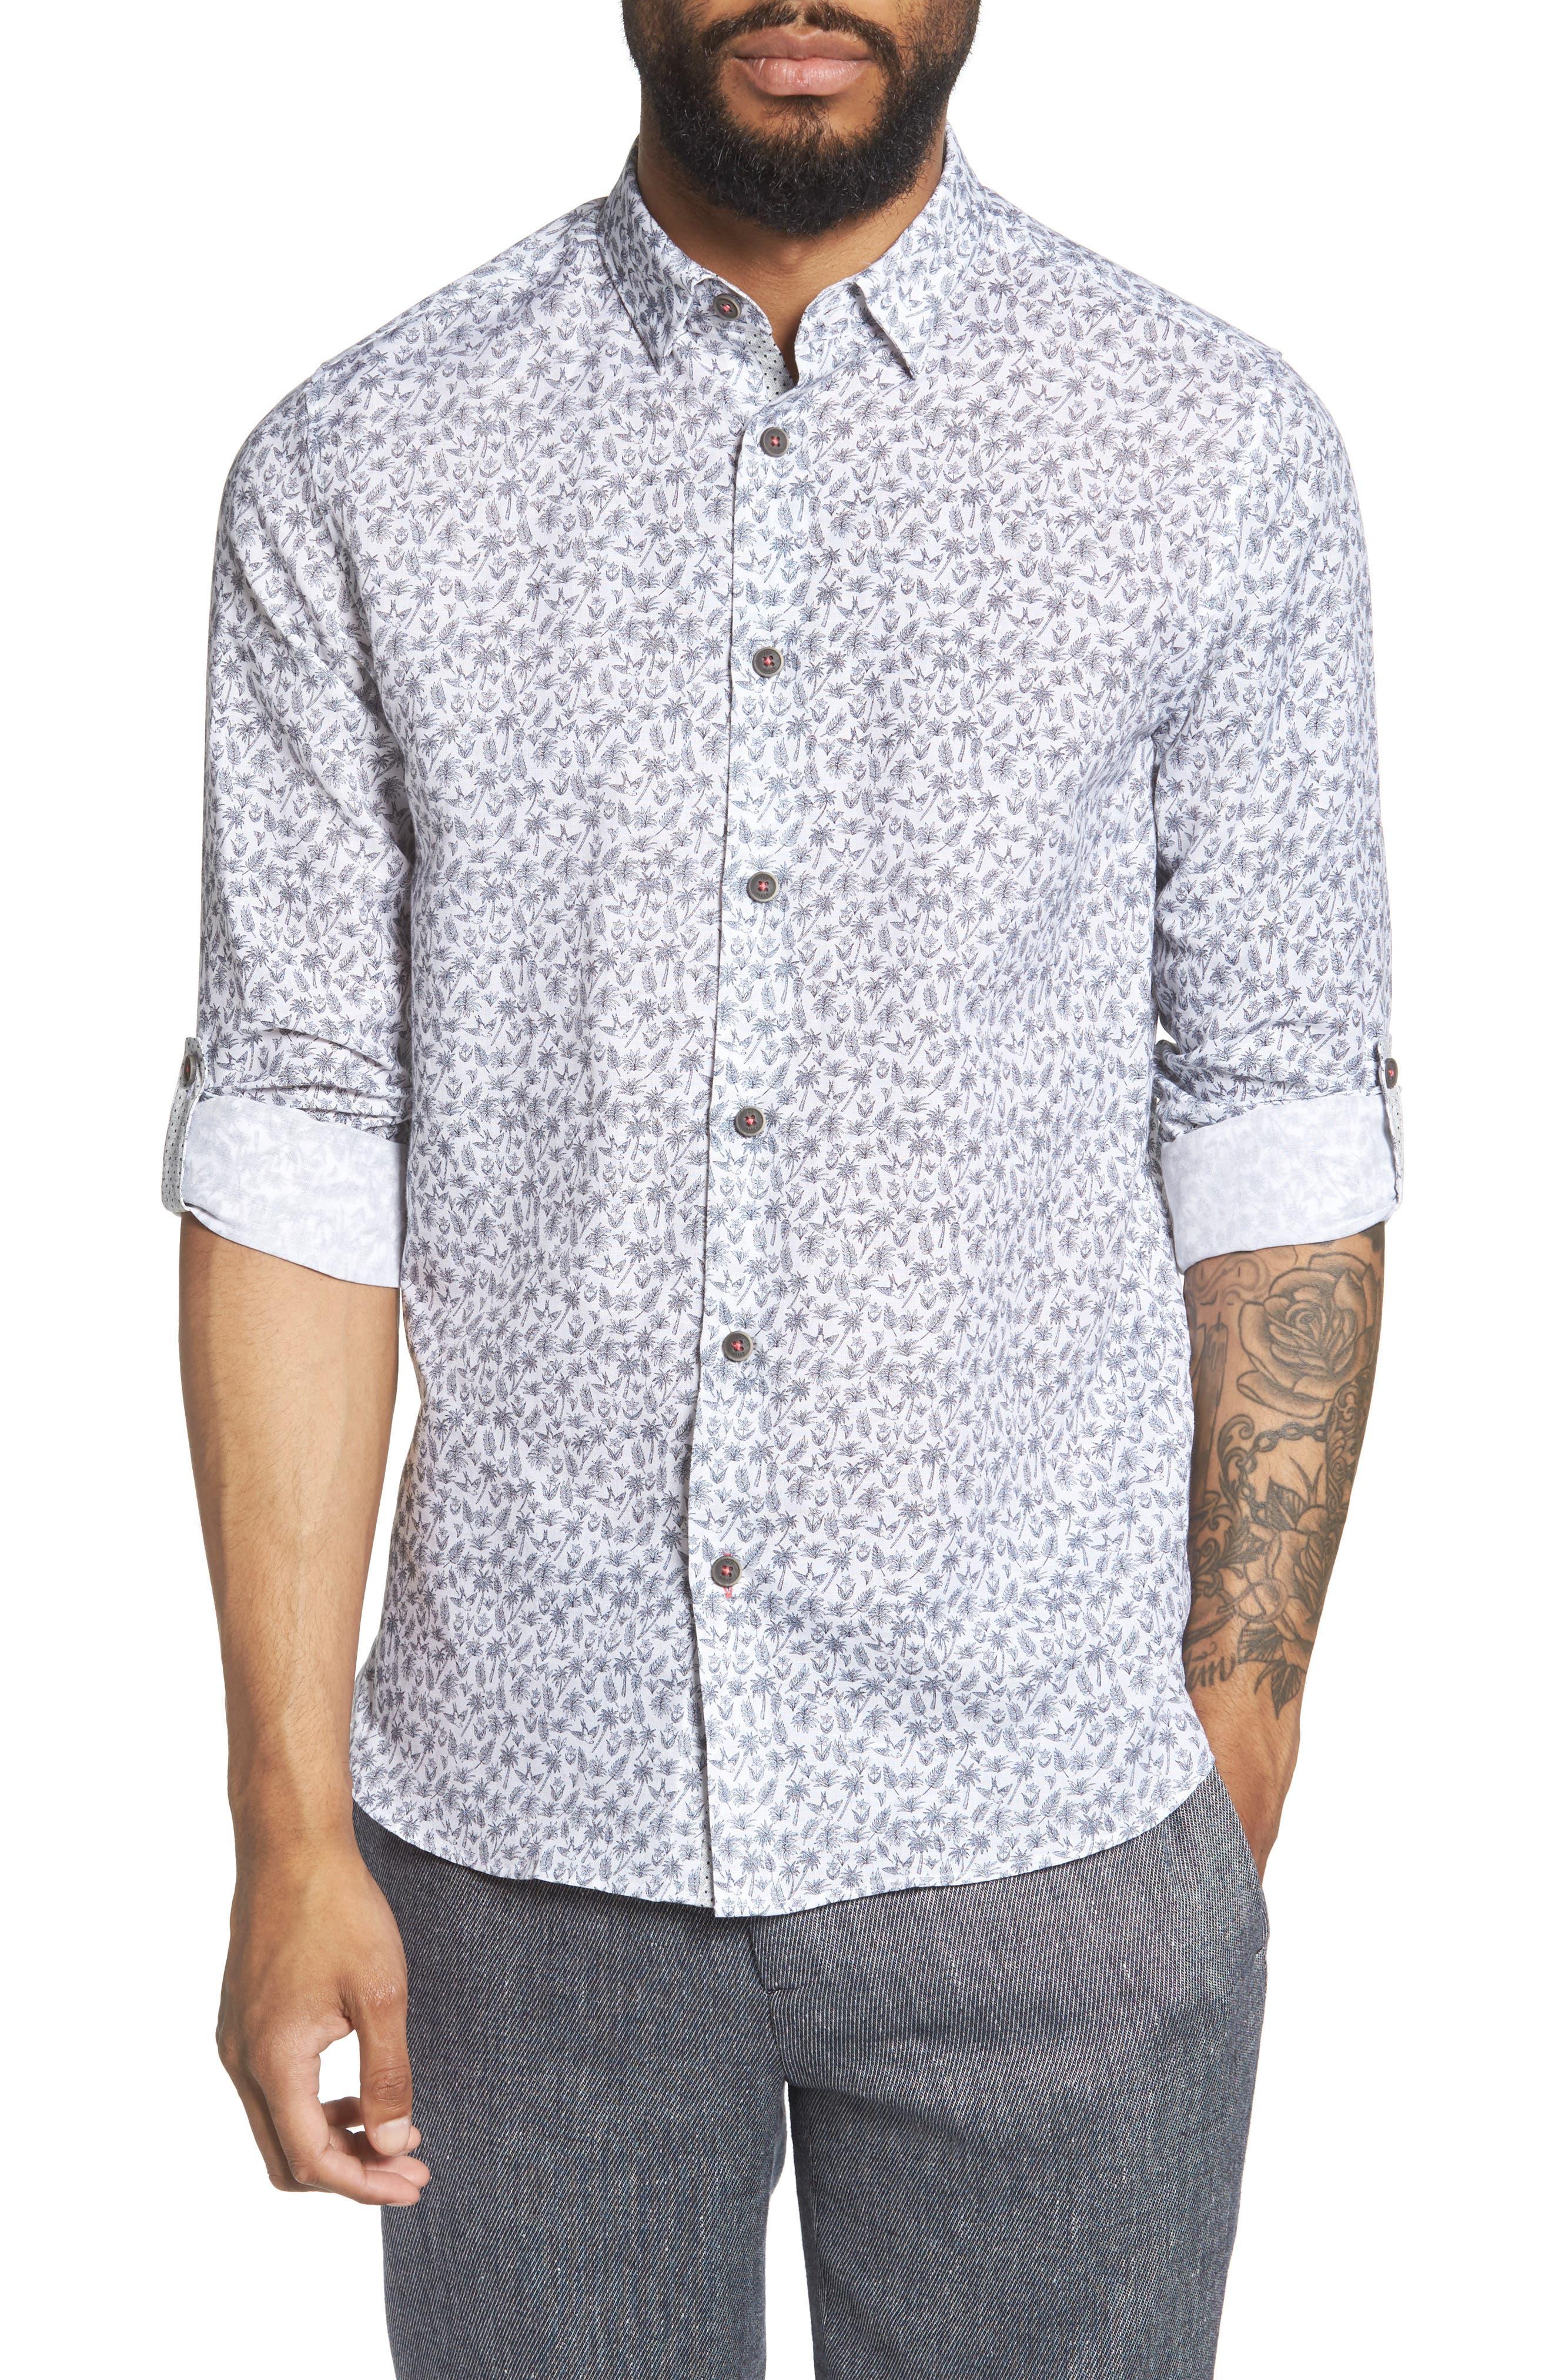 Nazta Trim Fit Tropical Print Sport Shirt,                             Main thumbnail 1, color,                             WHITE